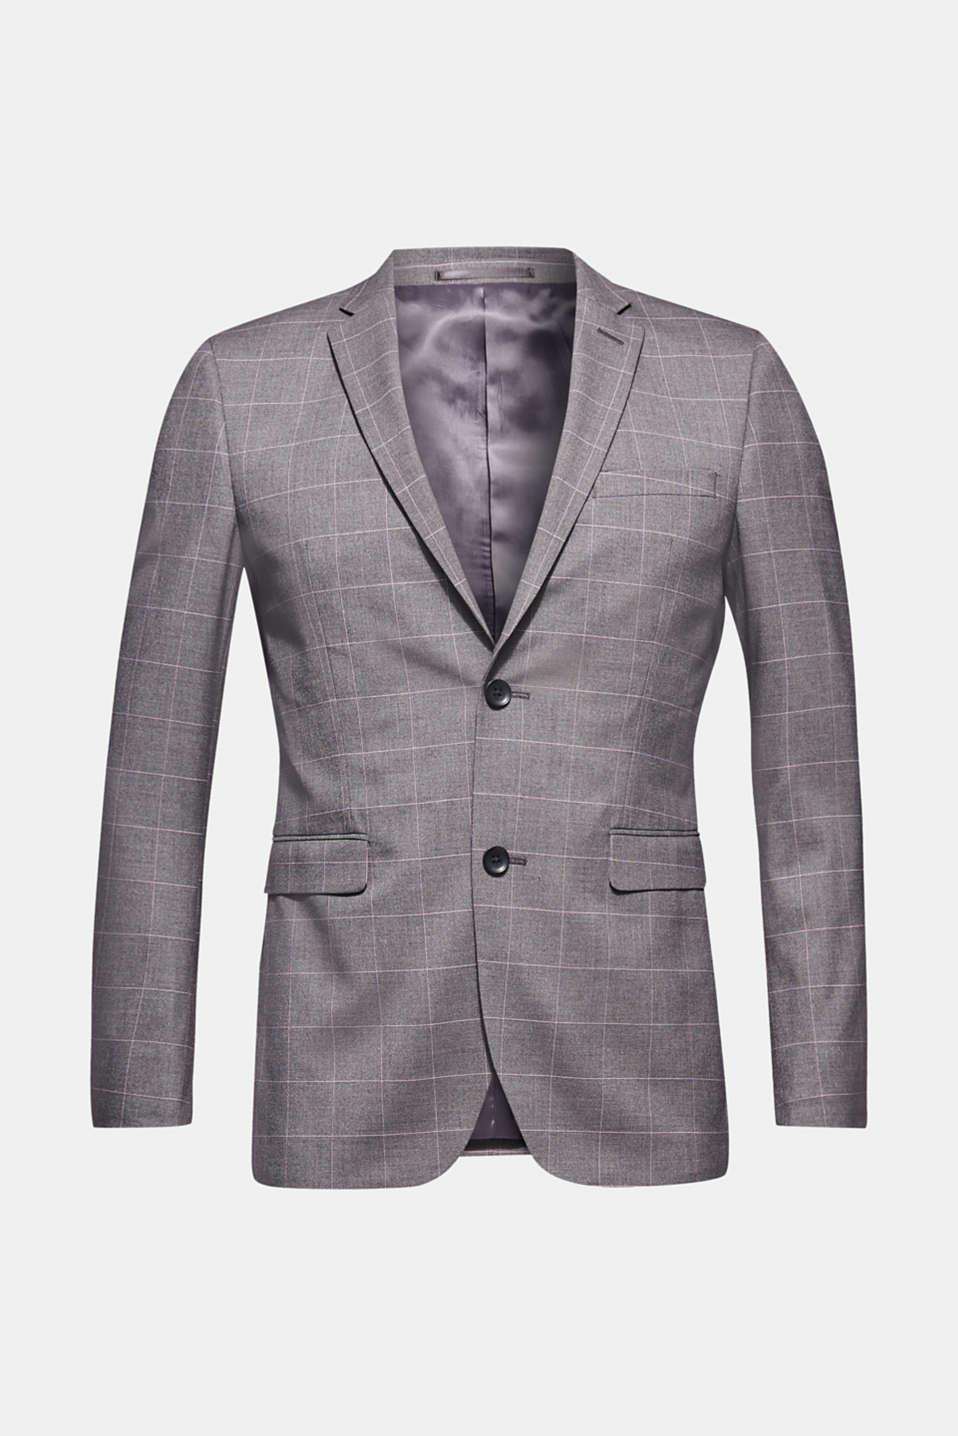 Blazers suit, GREY, detail image number 7